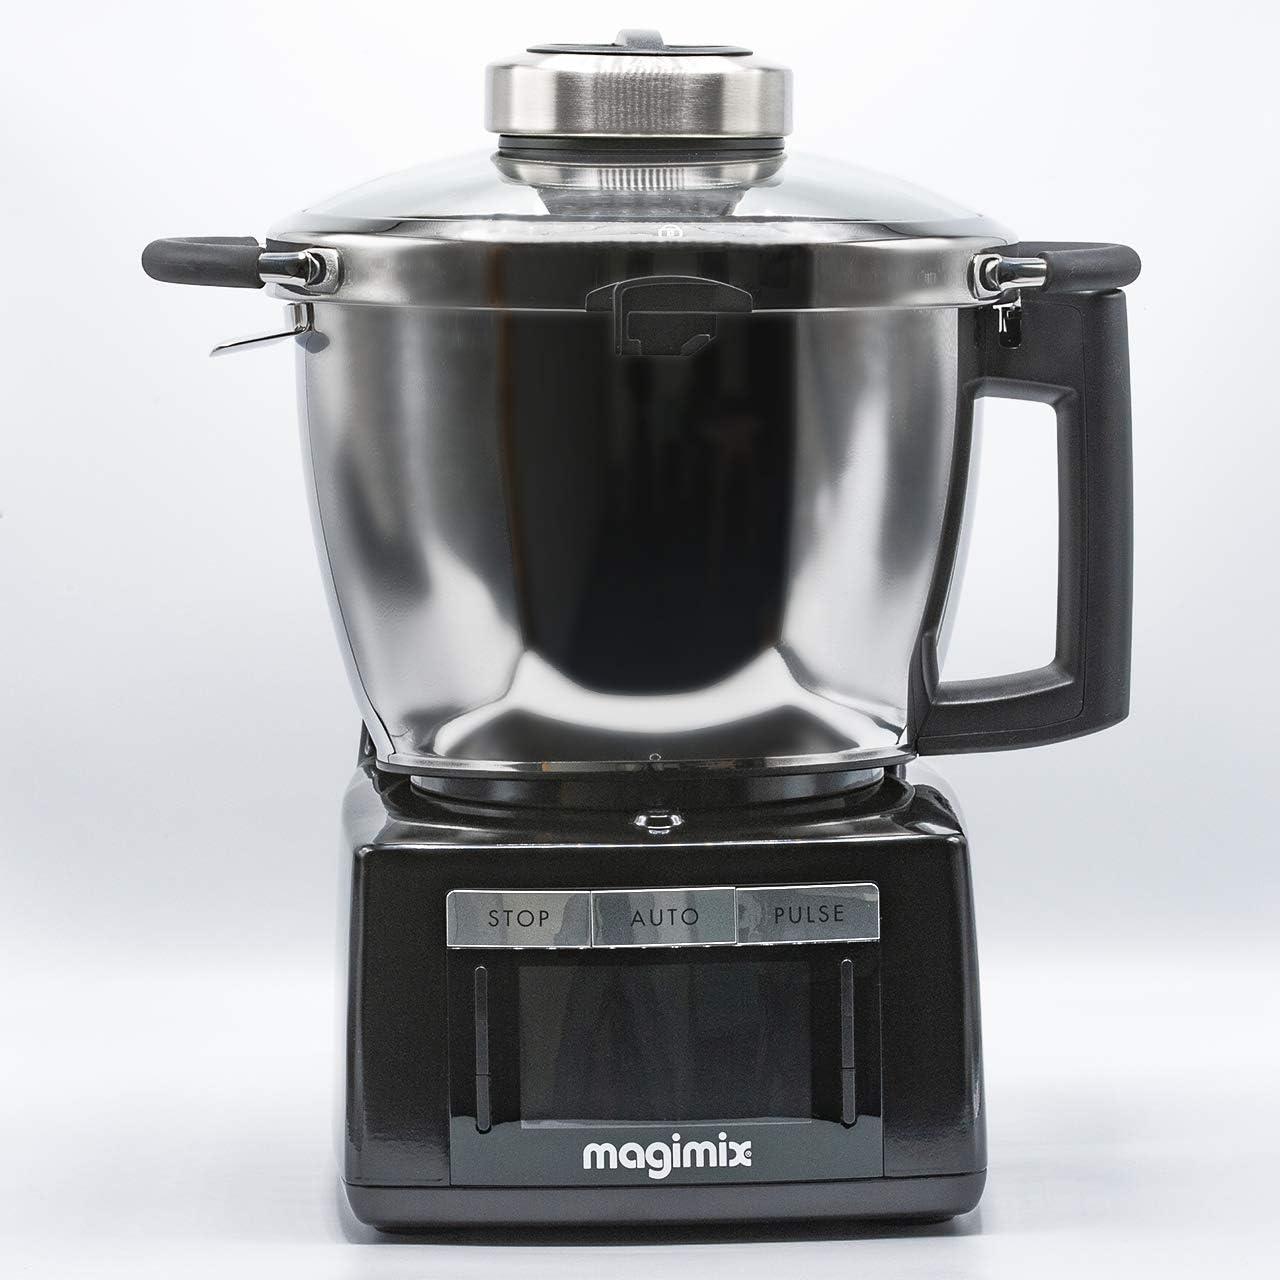 Magimix 18903 - Robot de cocina (Negro, Acero inoxidable, Acero inoxidable): Amazon.es: Hogar